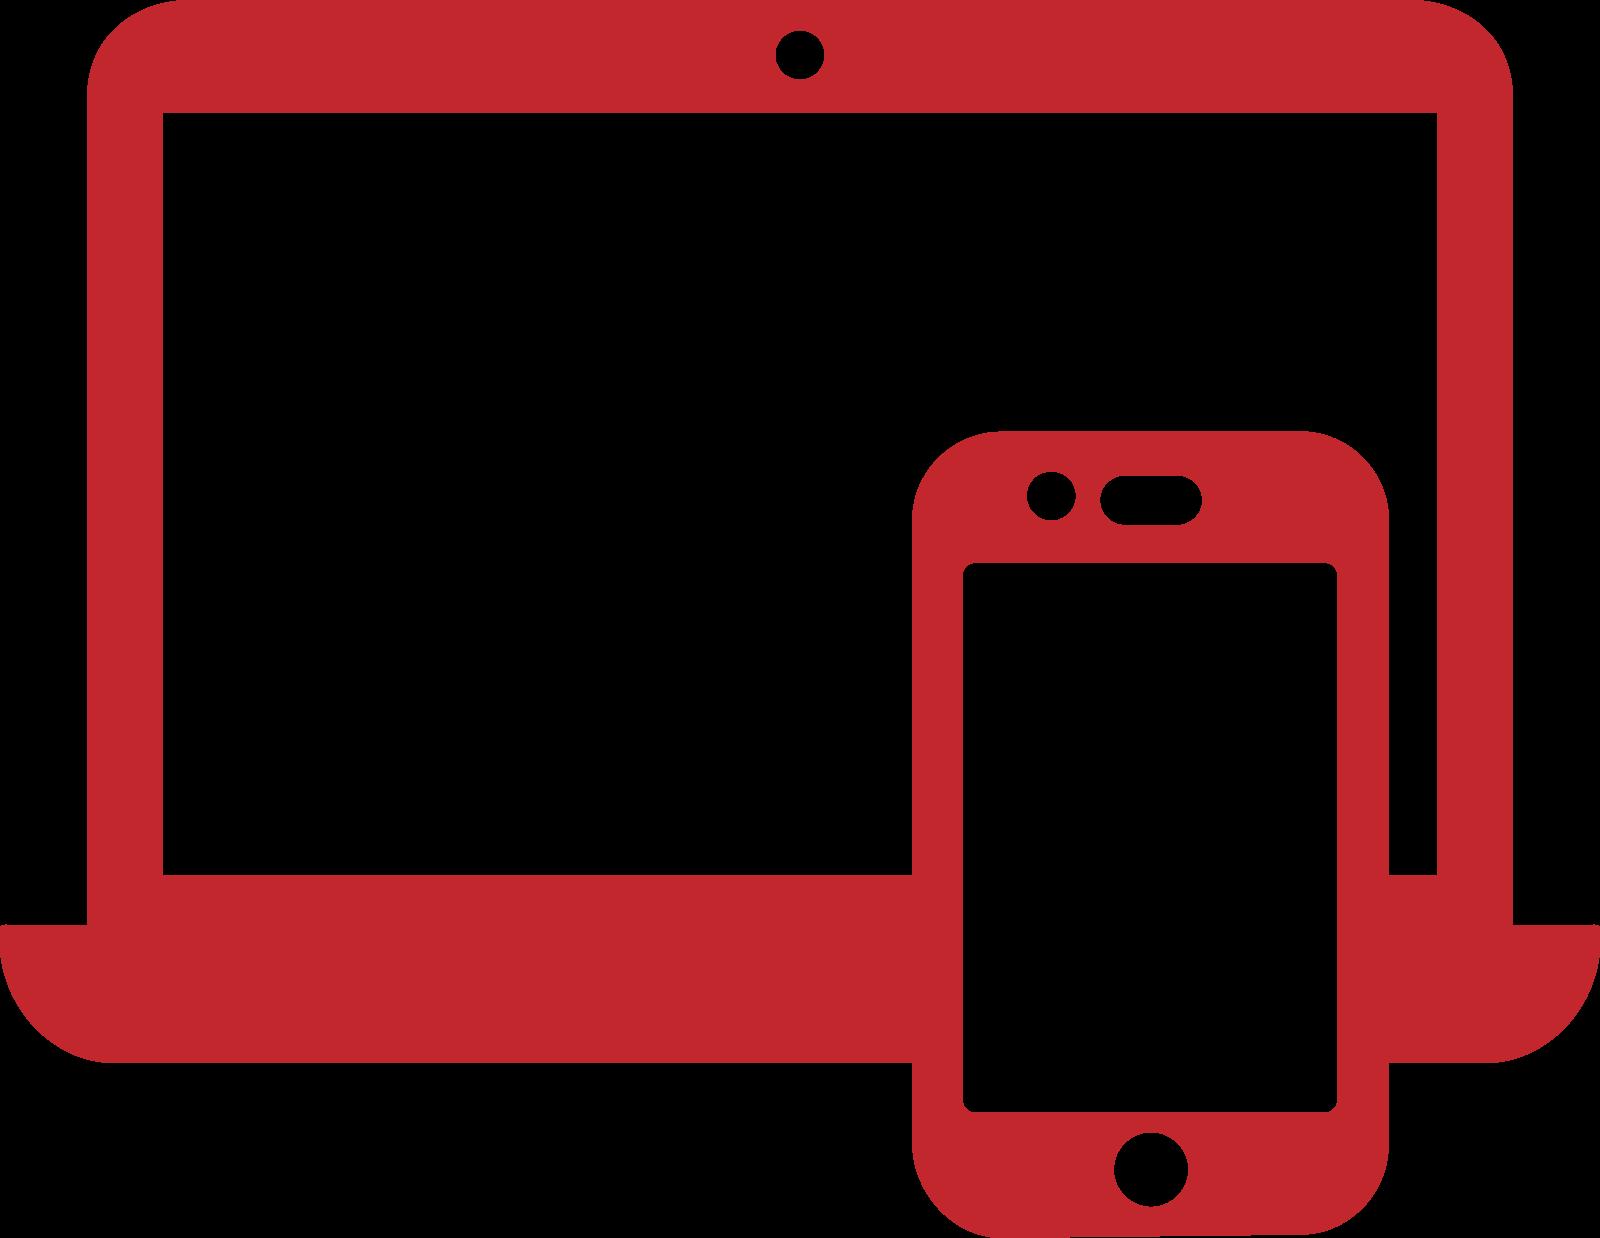 icone rouge de design packaging